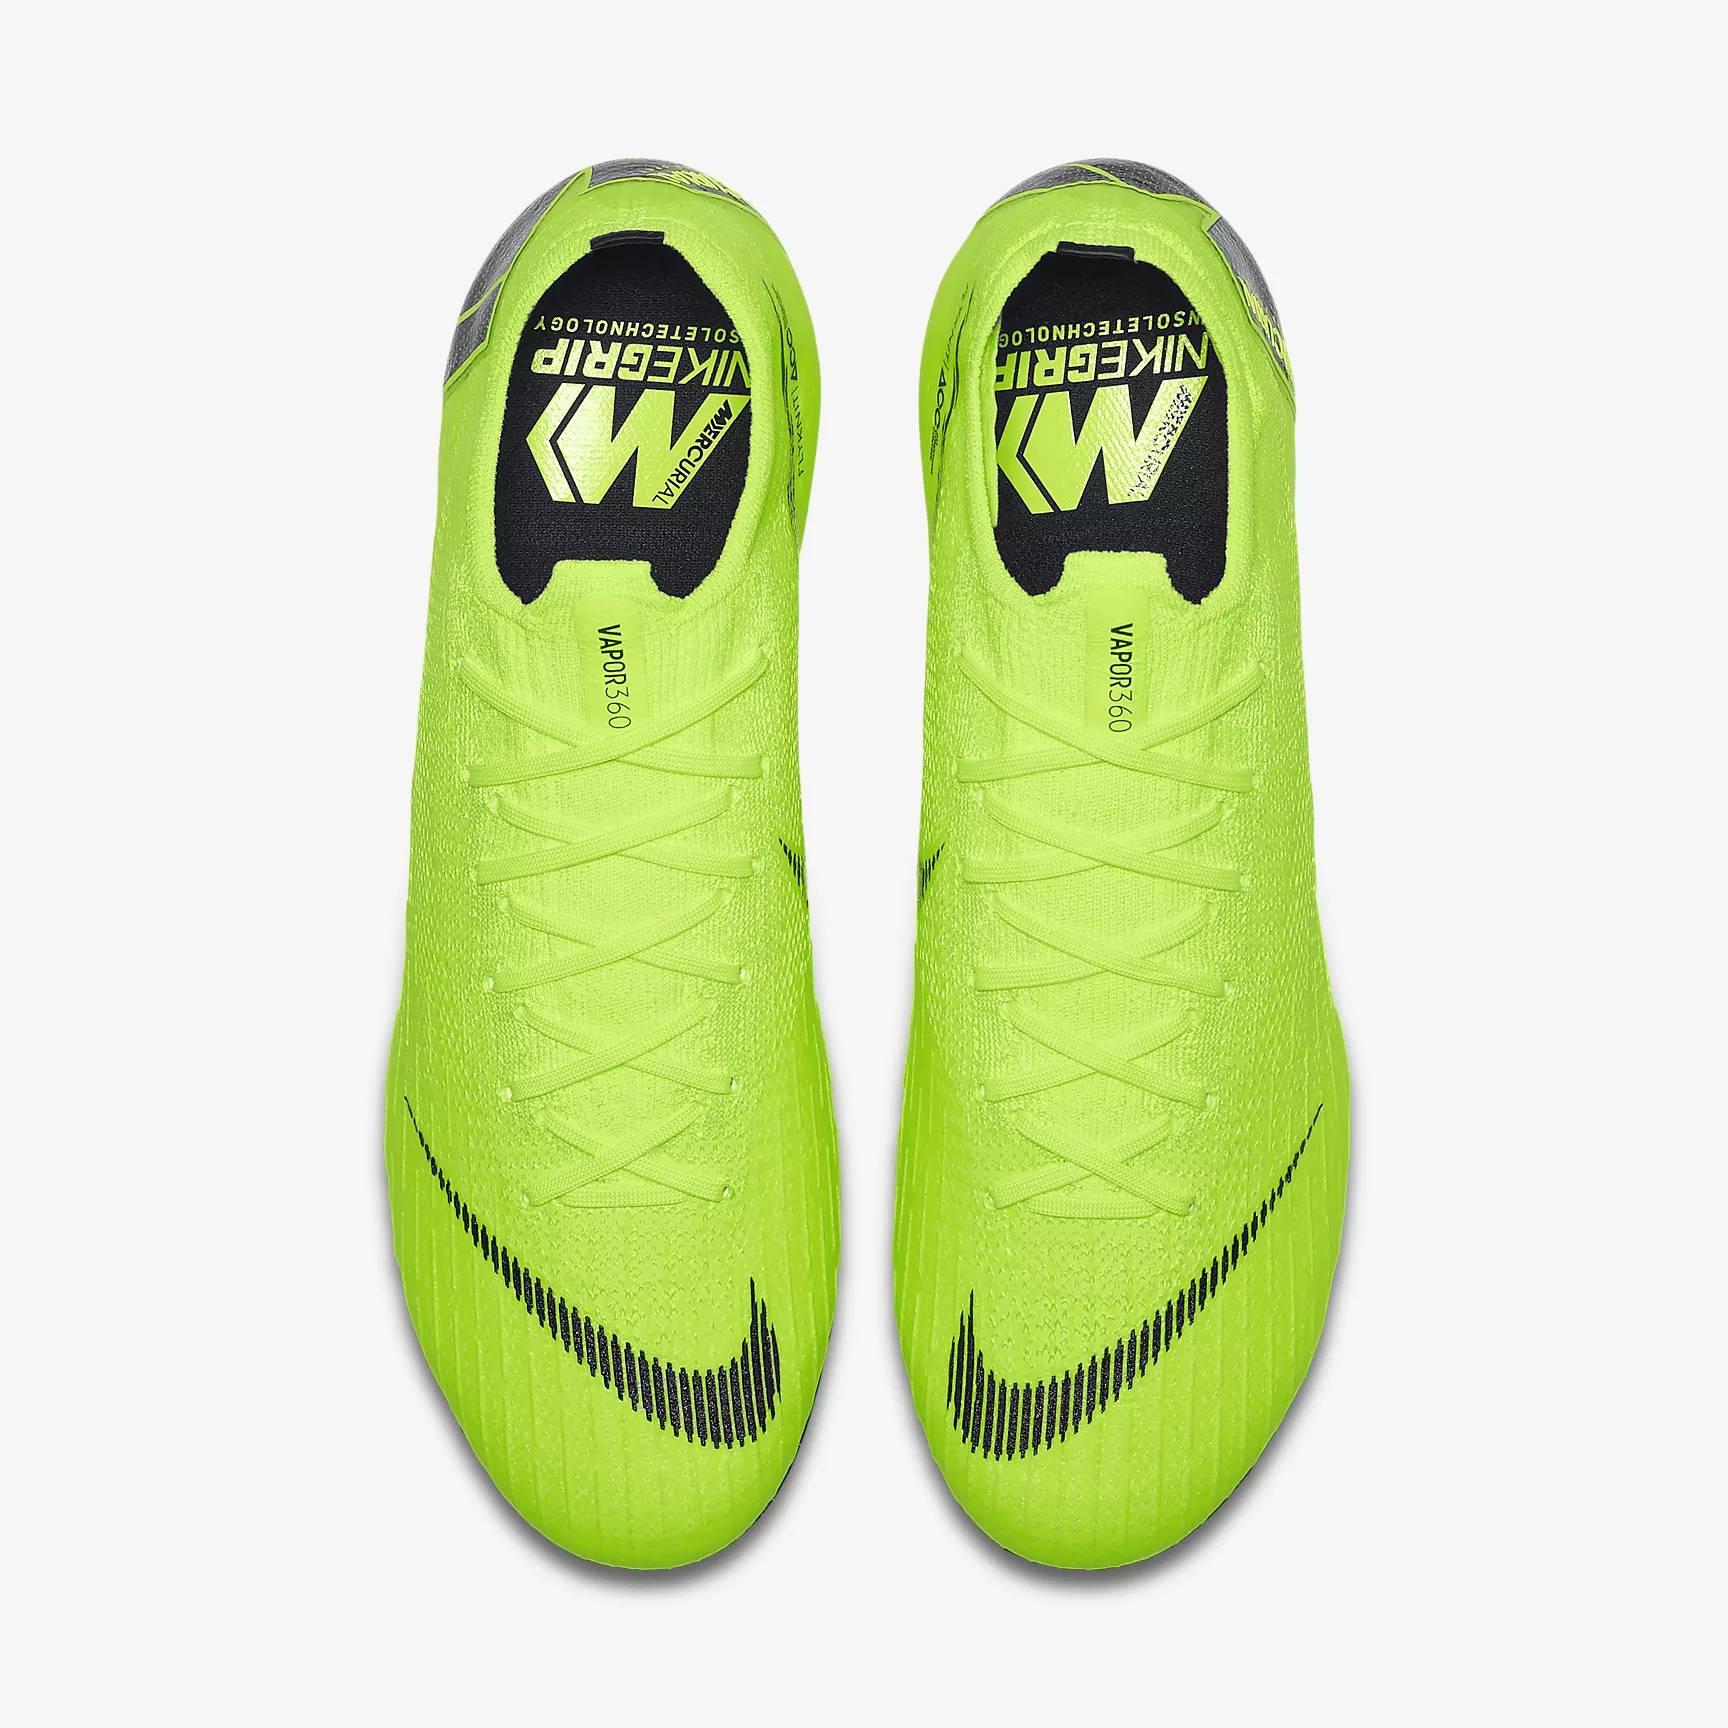 Nike Mercurial Vapor 360 Football Boot